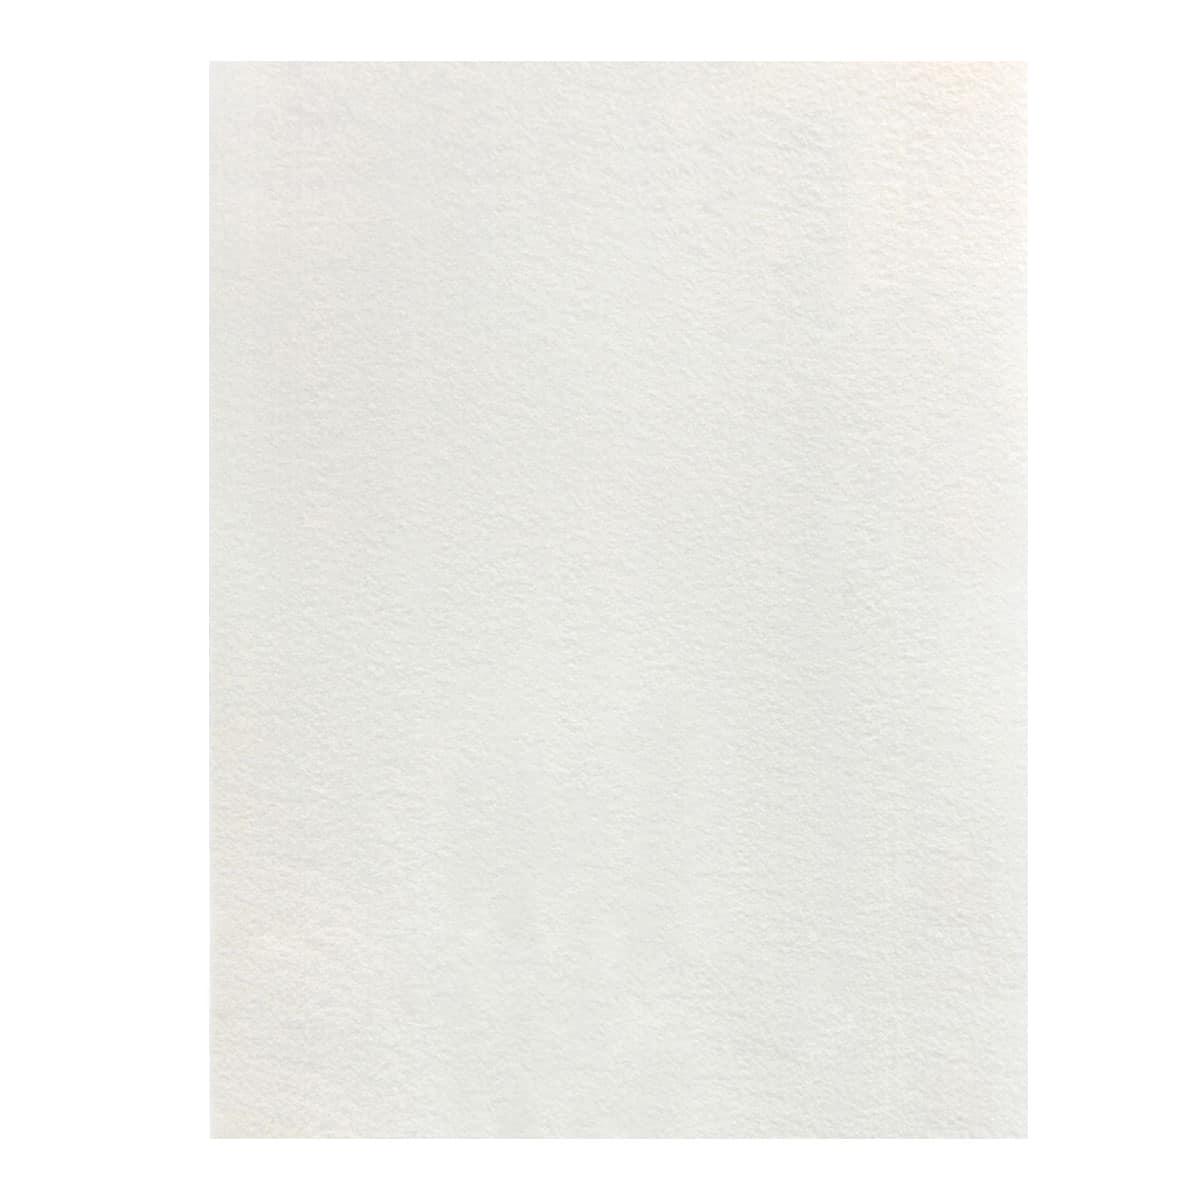 White Felt, 9x12 sheet